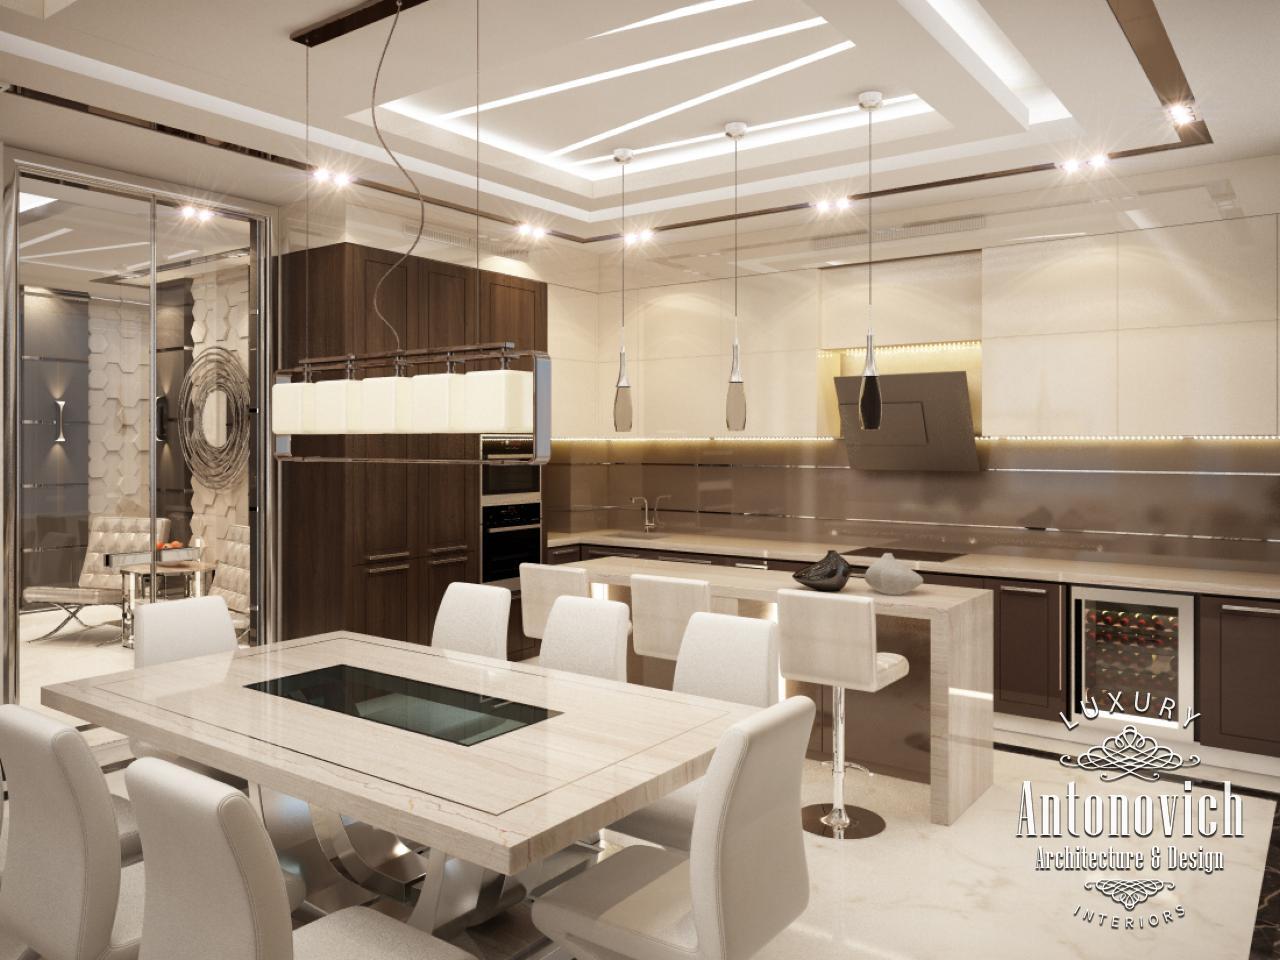 Modern Style In The Authoru0027s Works Of Luxury Antonovich Design, Reflect  Future In Interior Design.